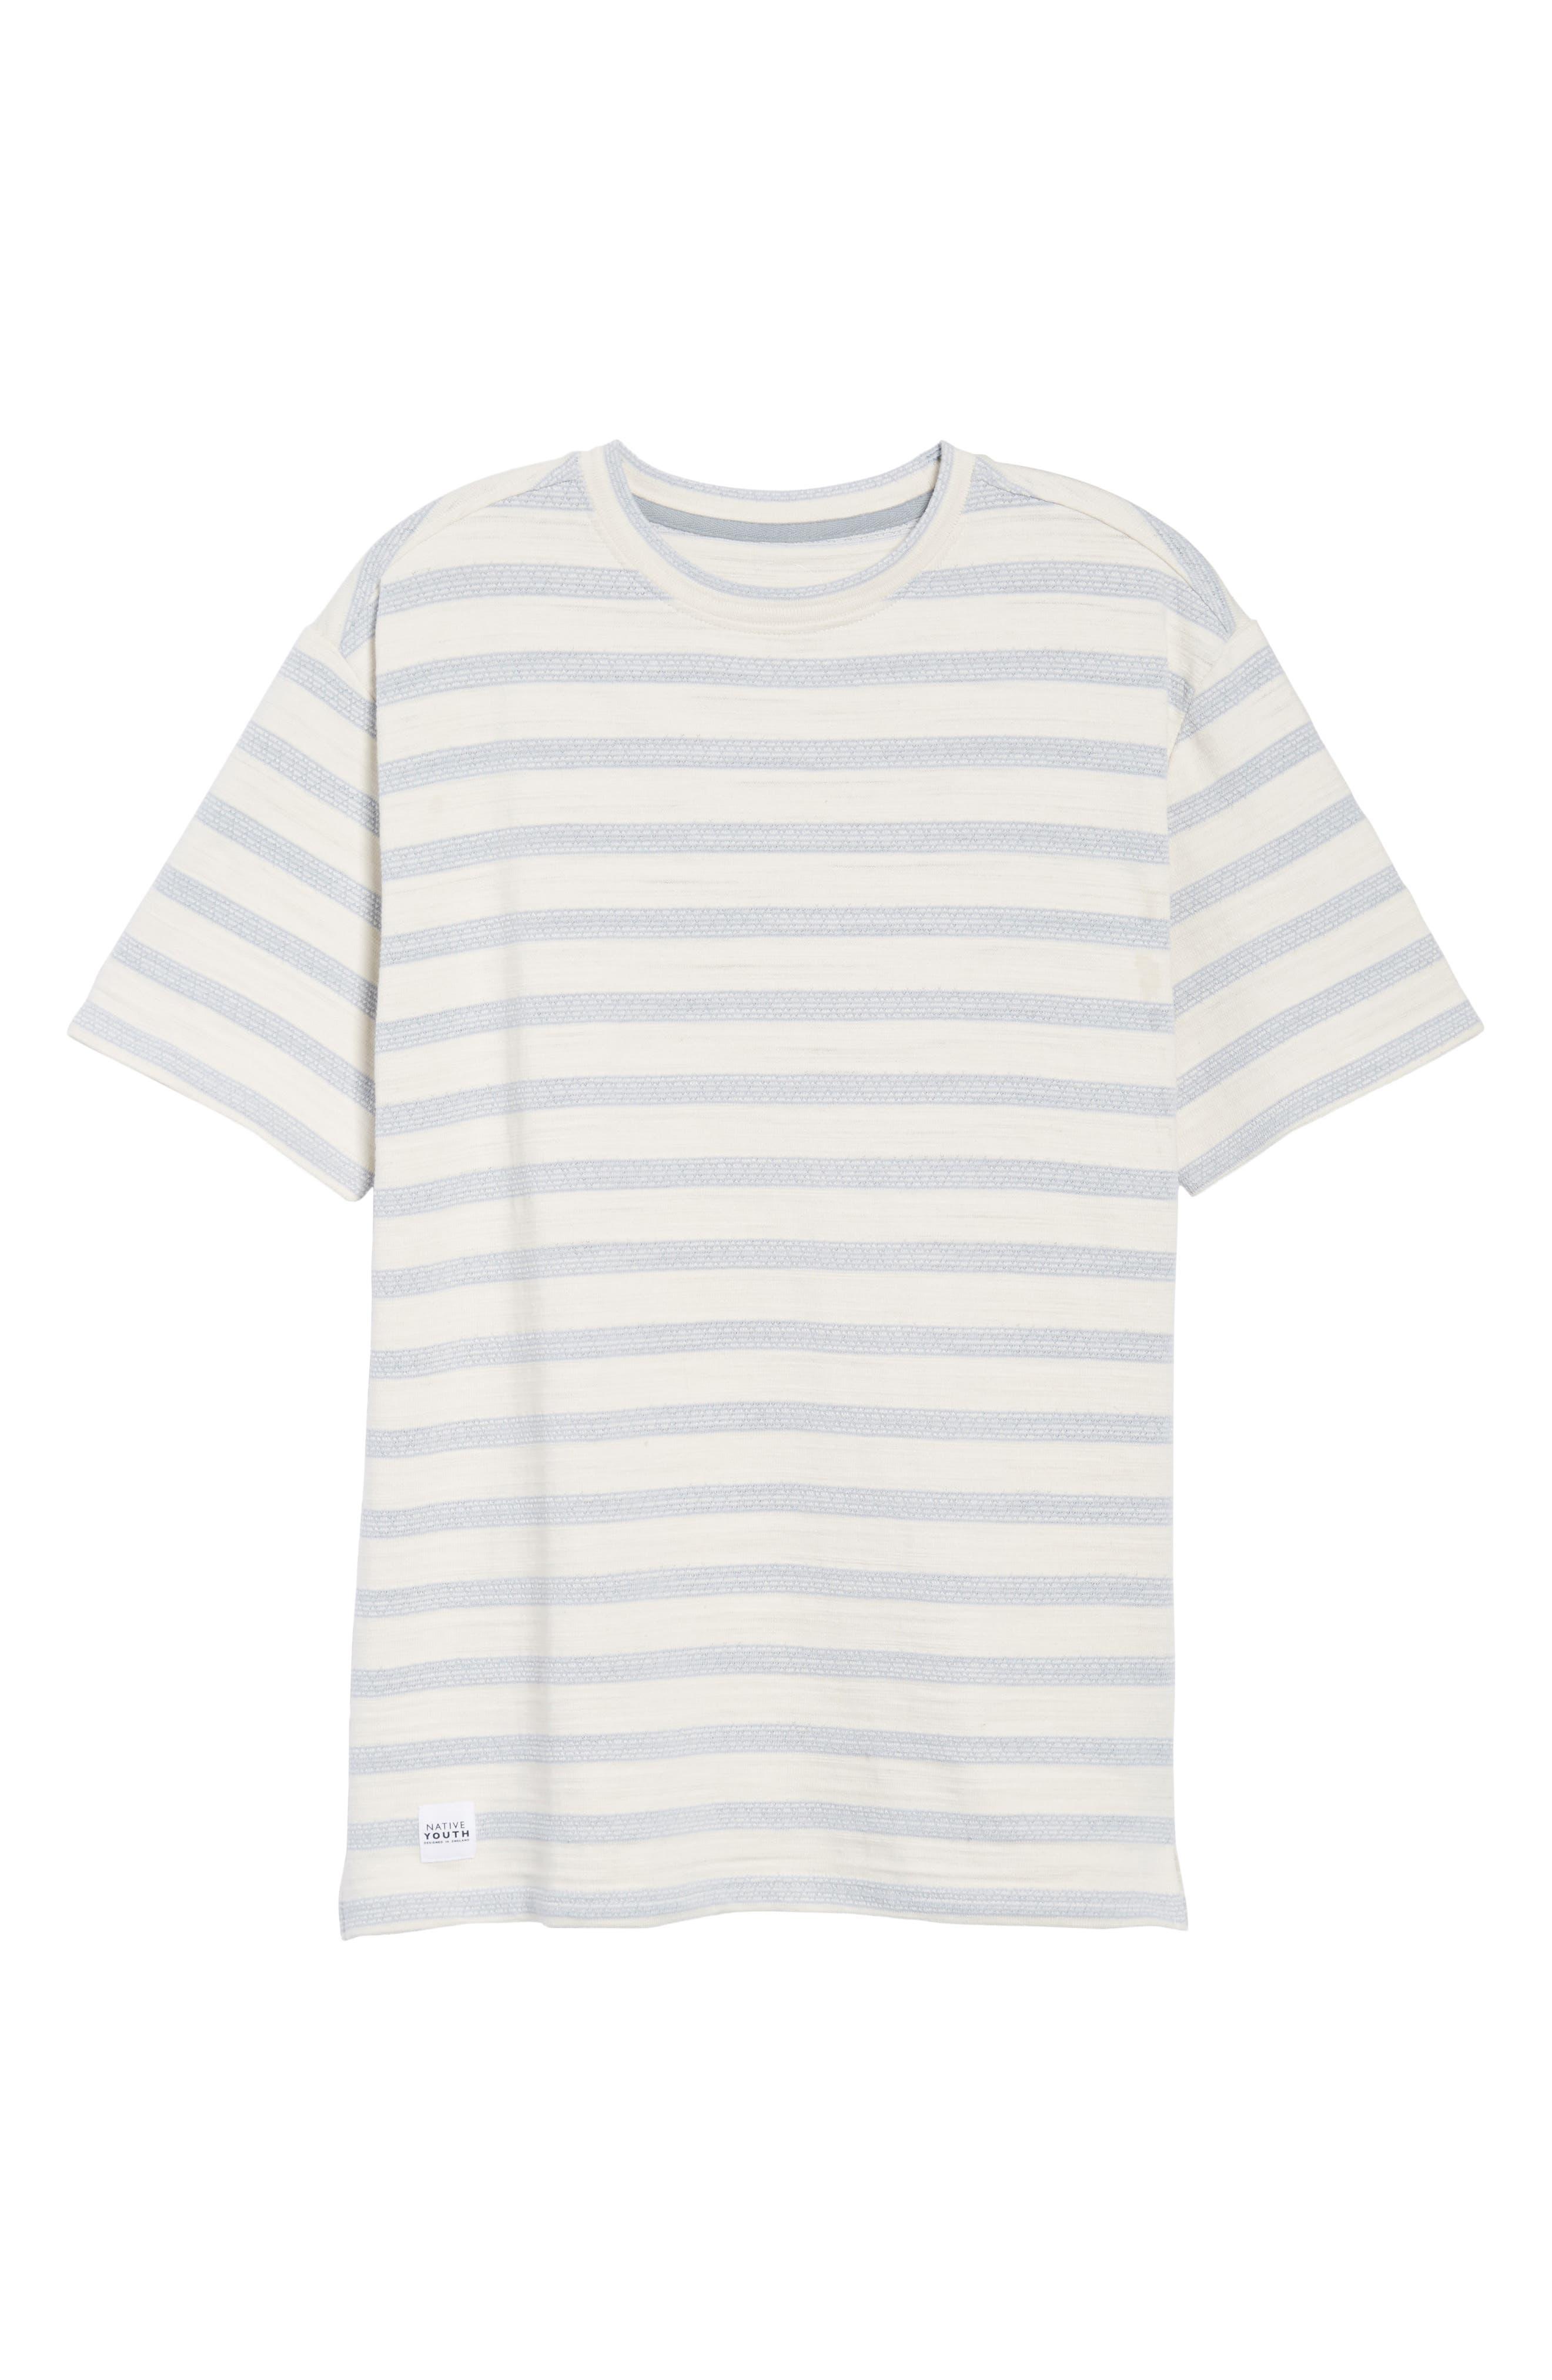 Waves T-Shirt,                             Alternate thumbnail 6, color,                             900